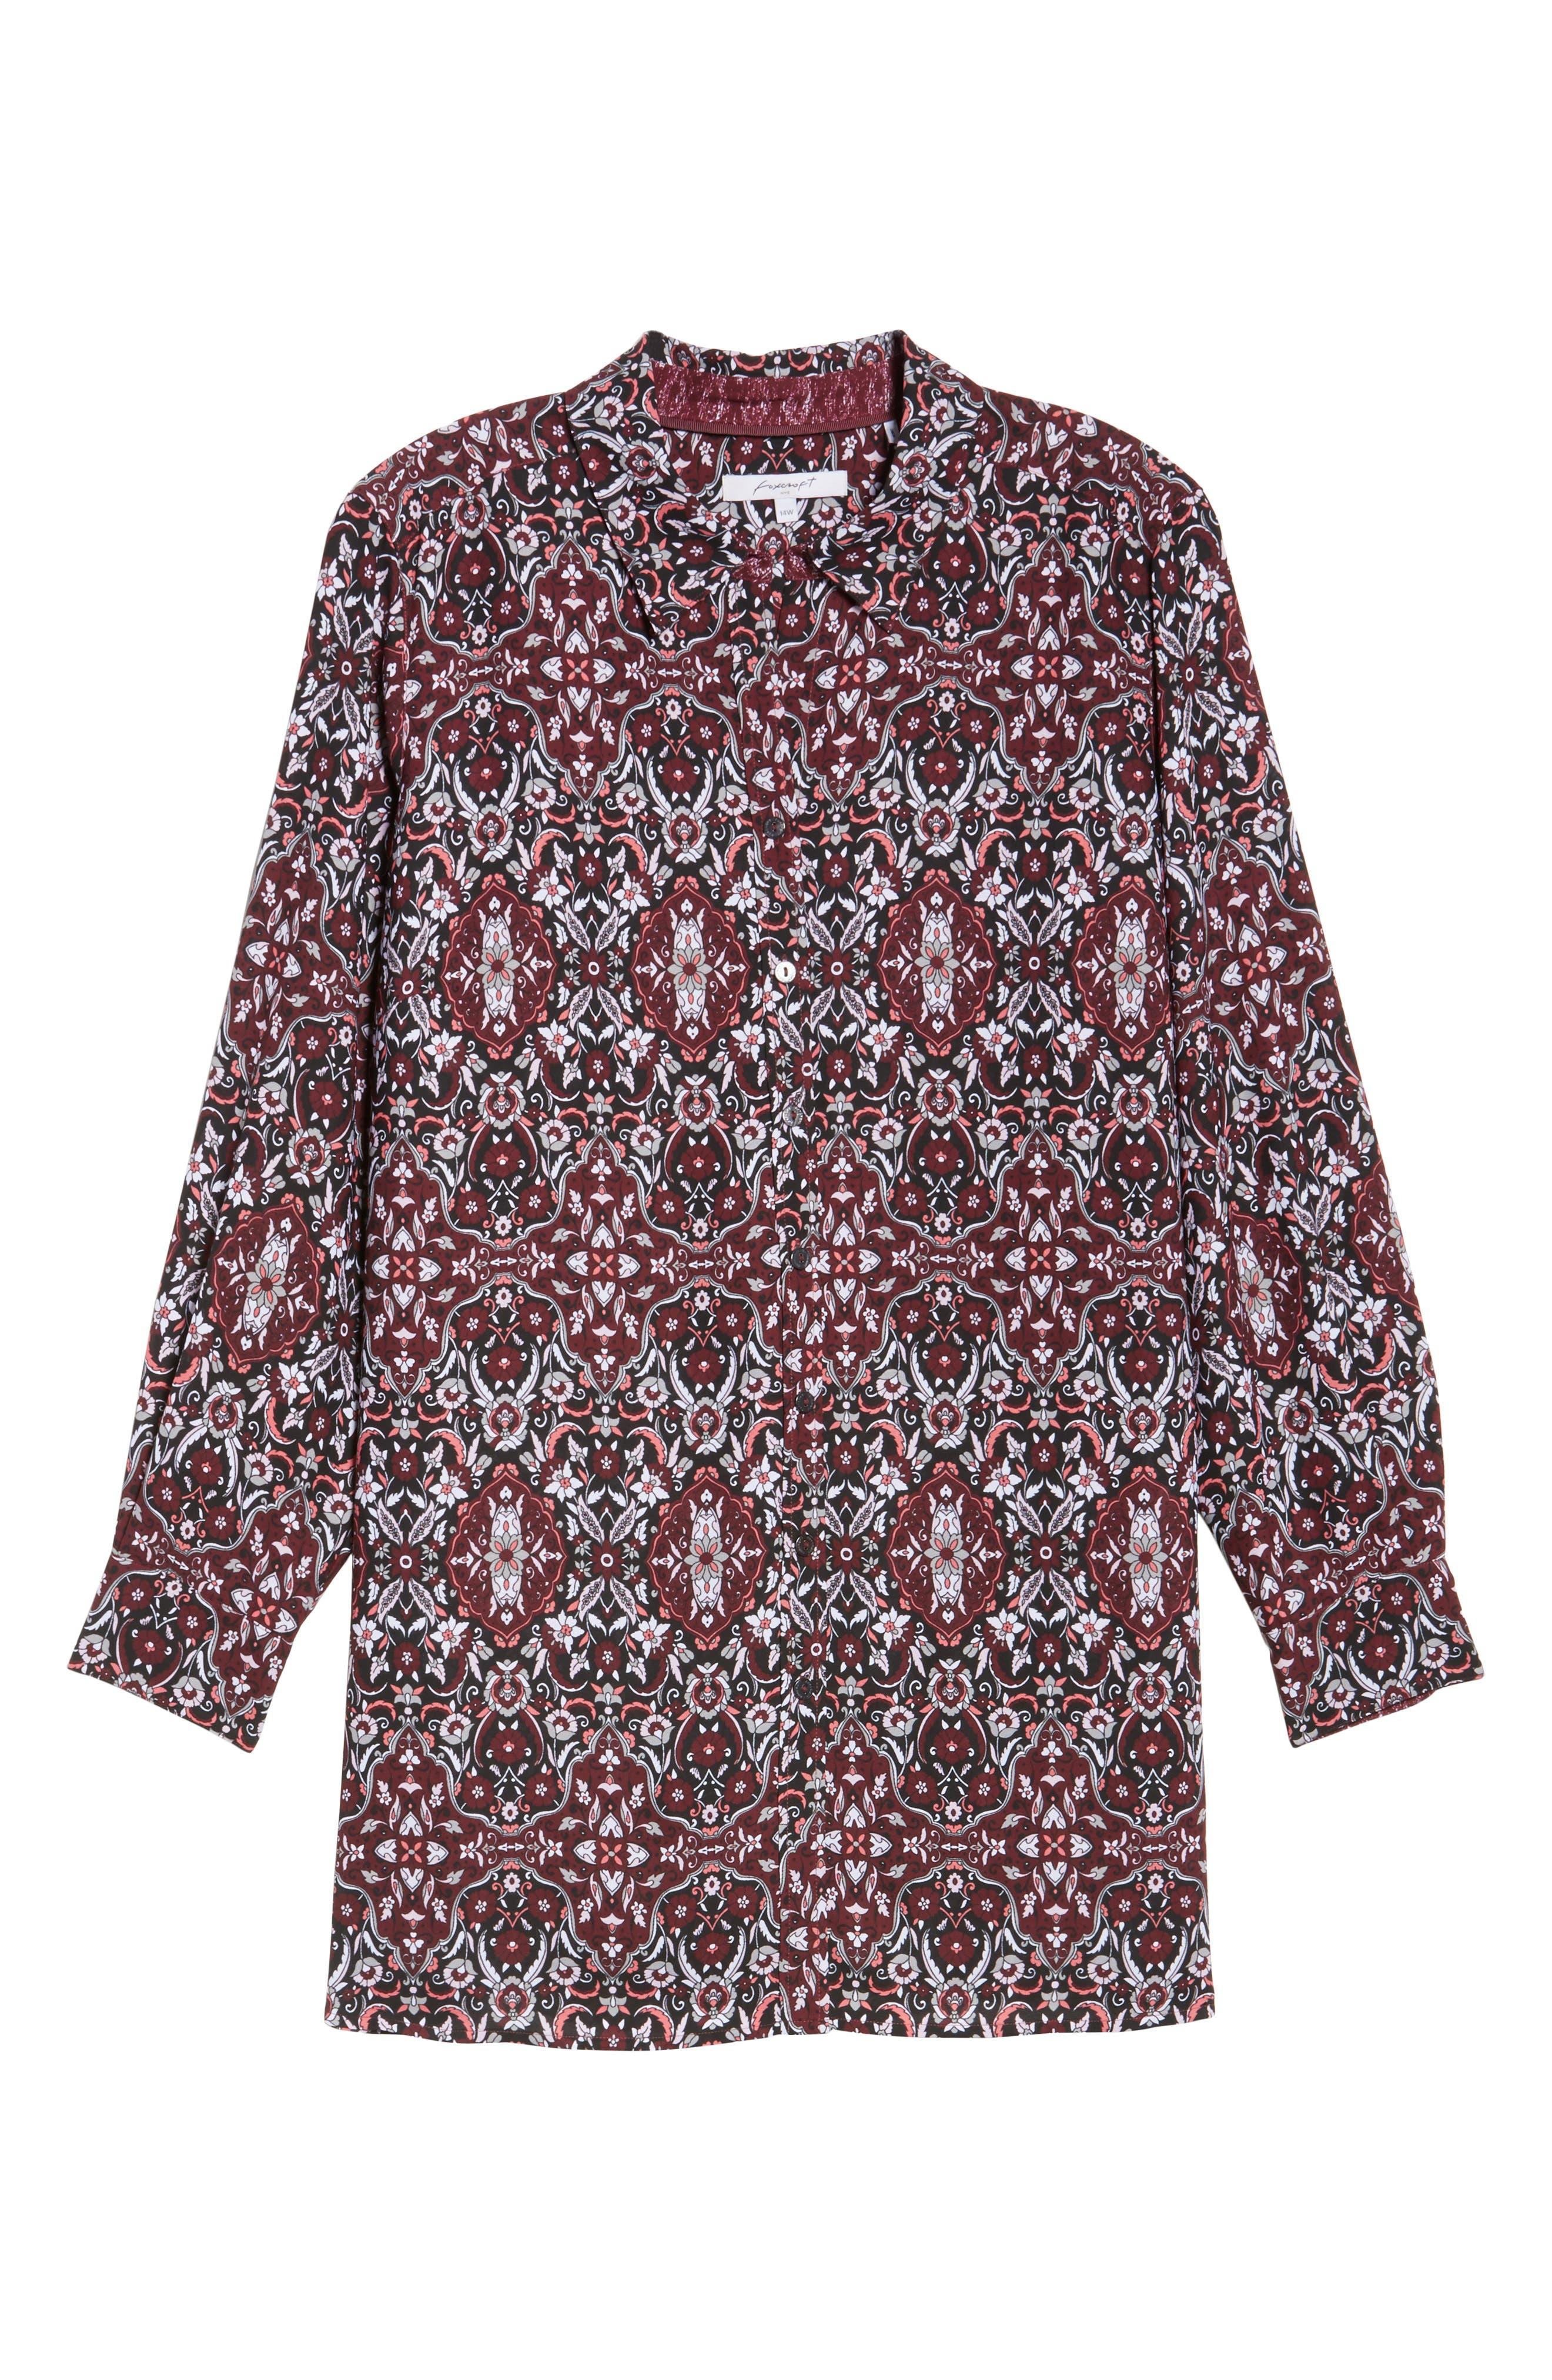 Jade Heirloom Paisley Shirt,                             Alternate thumbnail 6, color,                             602